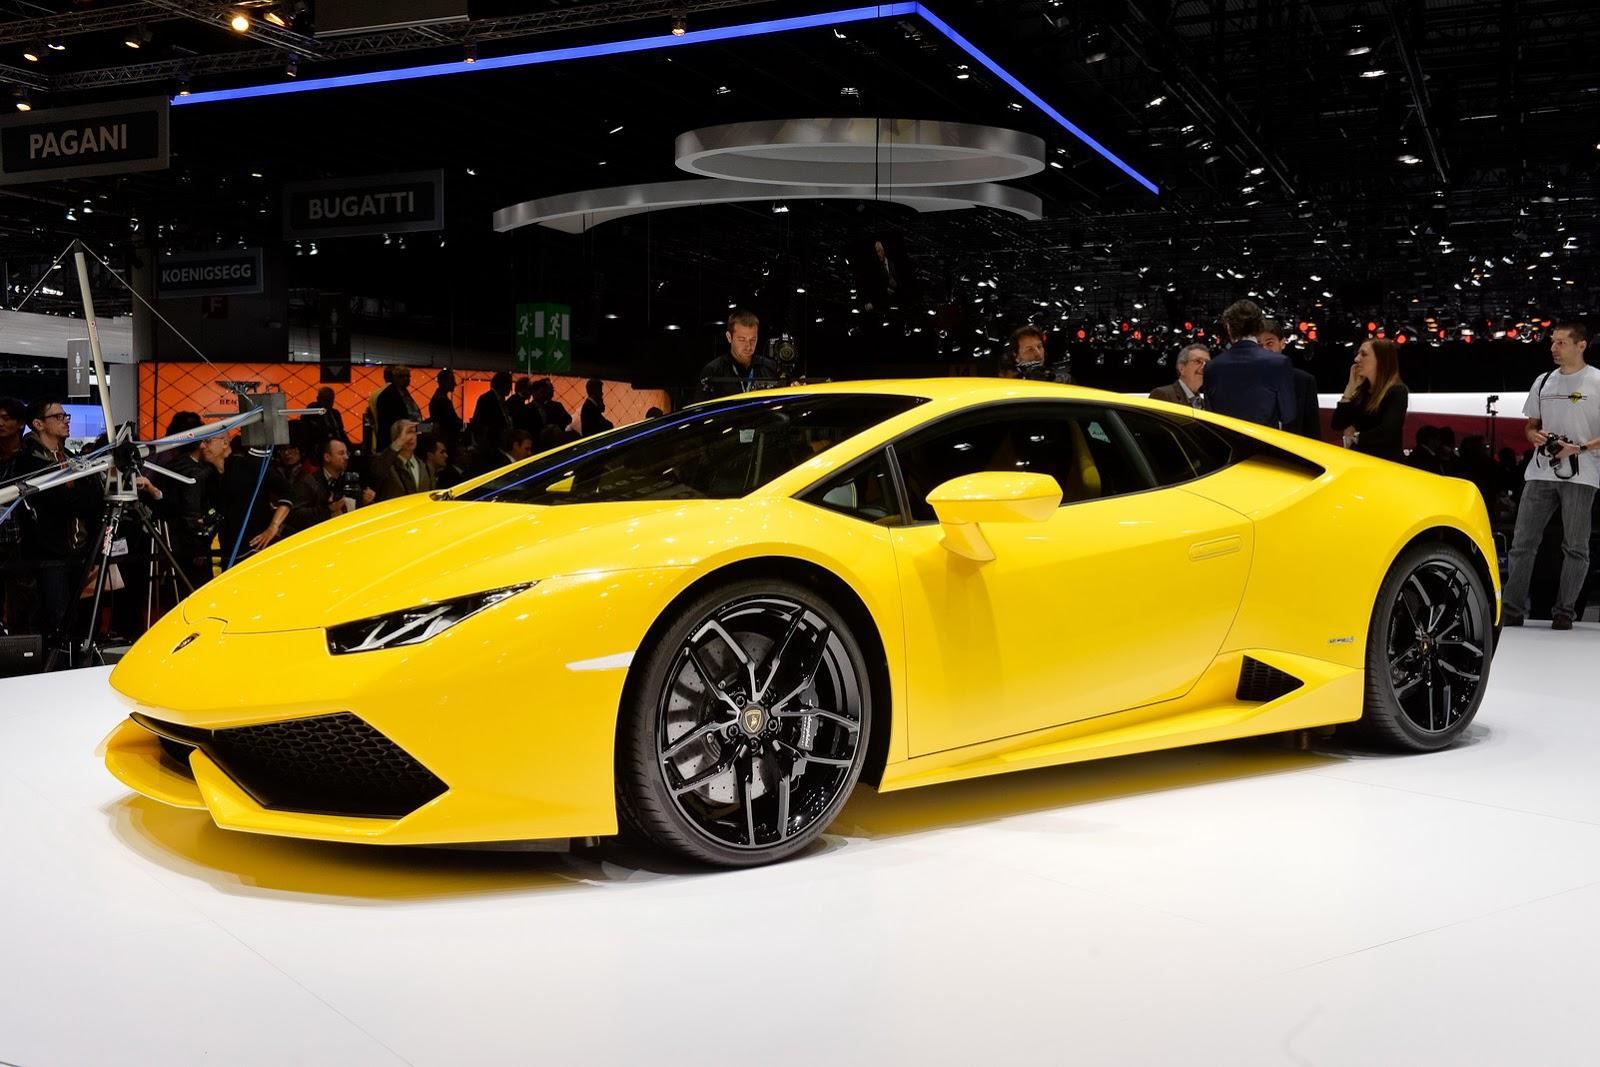 Motor Show: New 2015 Lamborghini Huracán LP 610-4